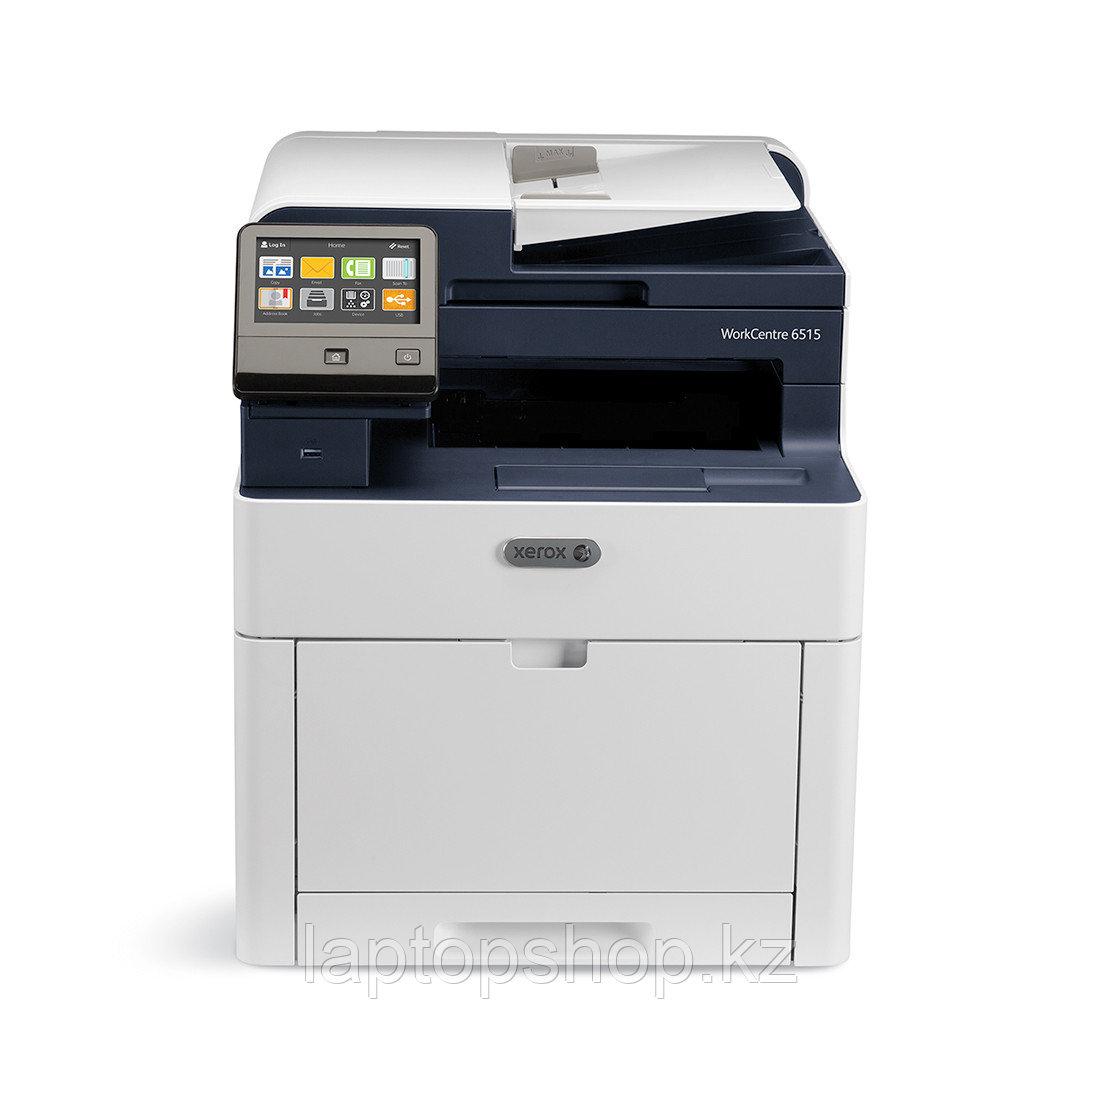 Цветное МФУ Xerox WorkCentre 6515N